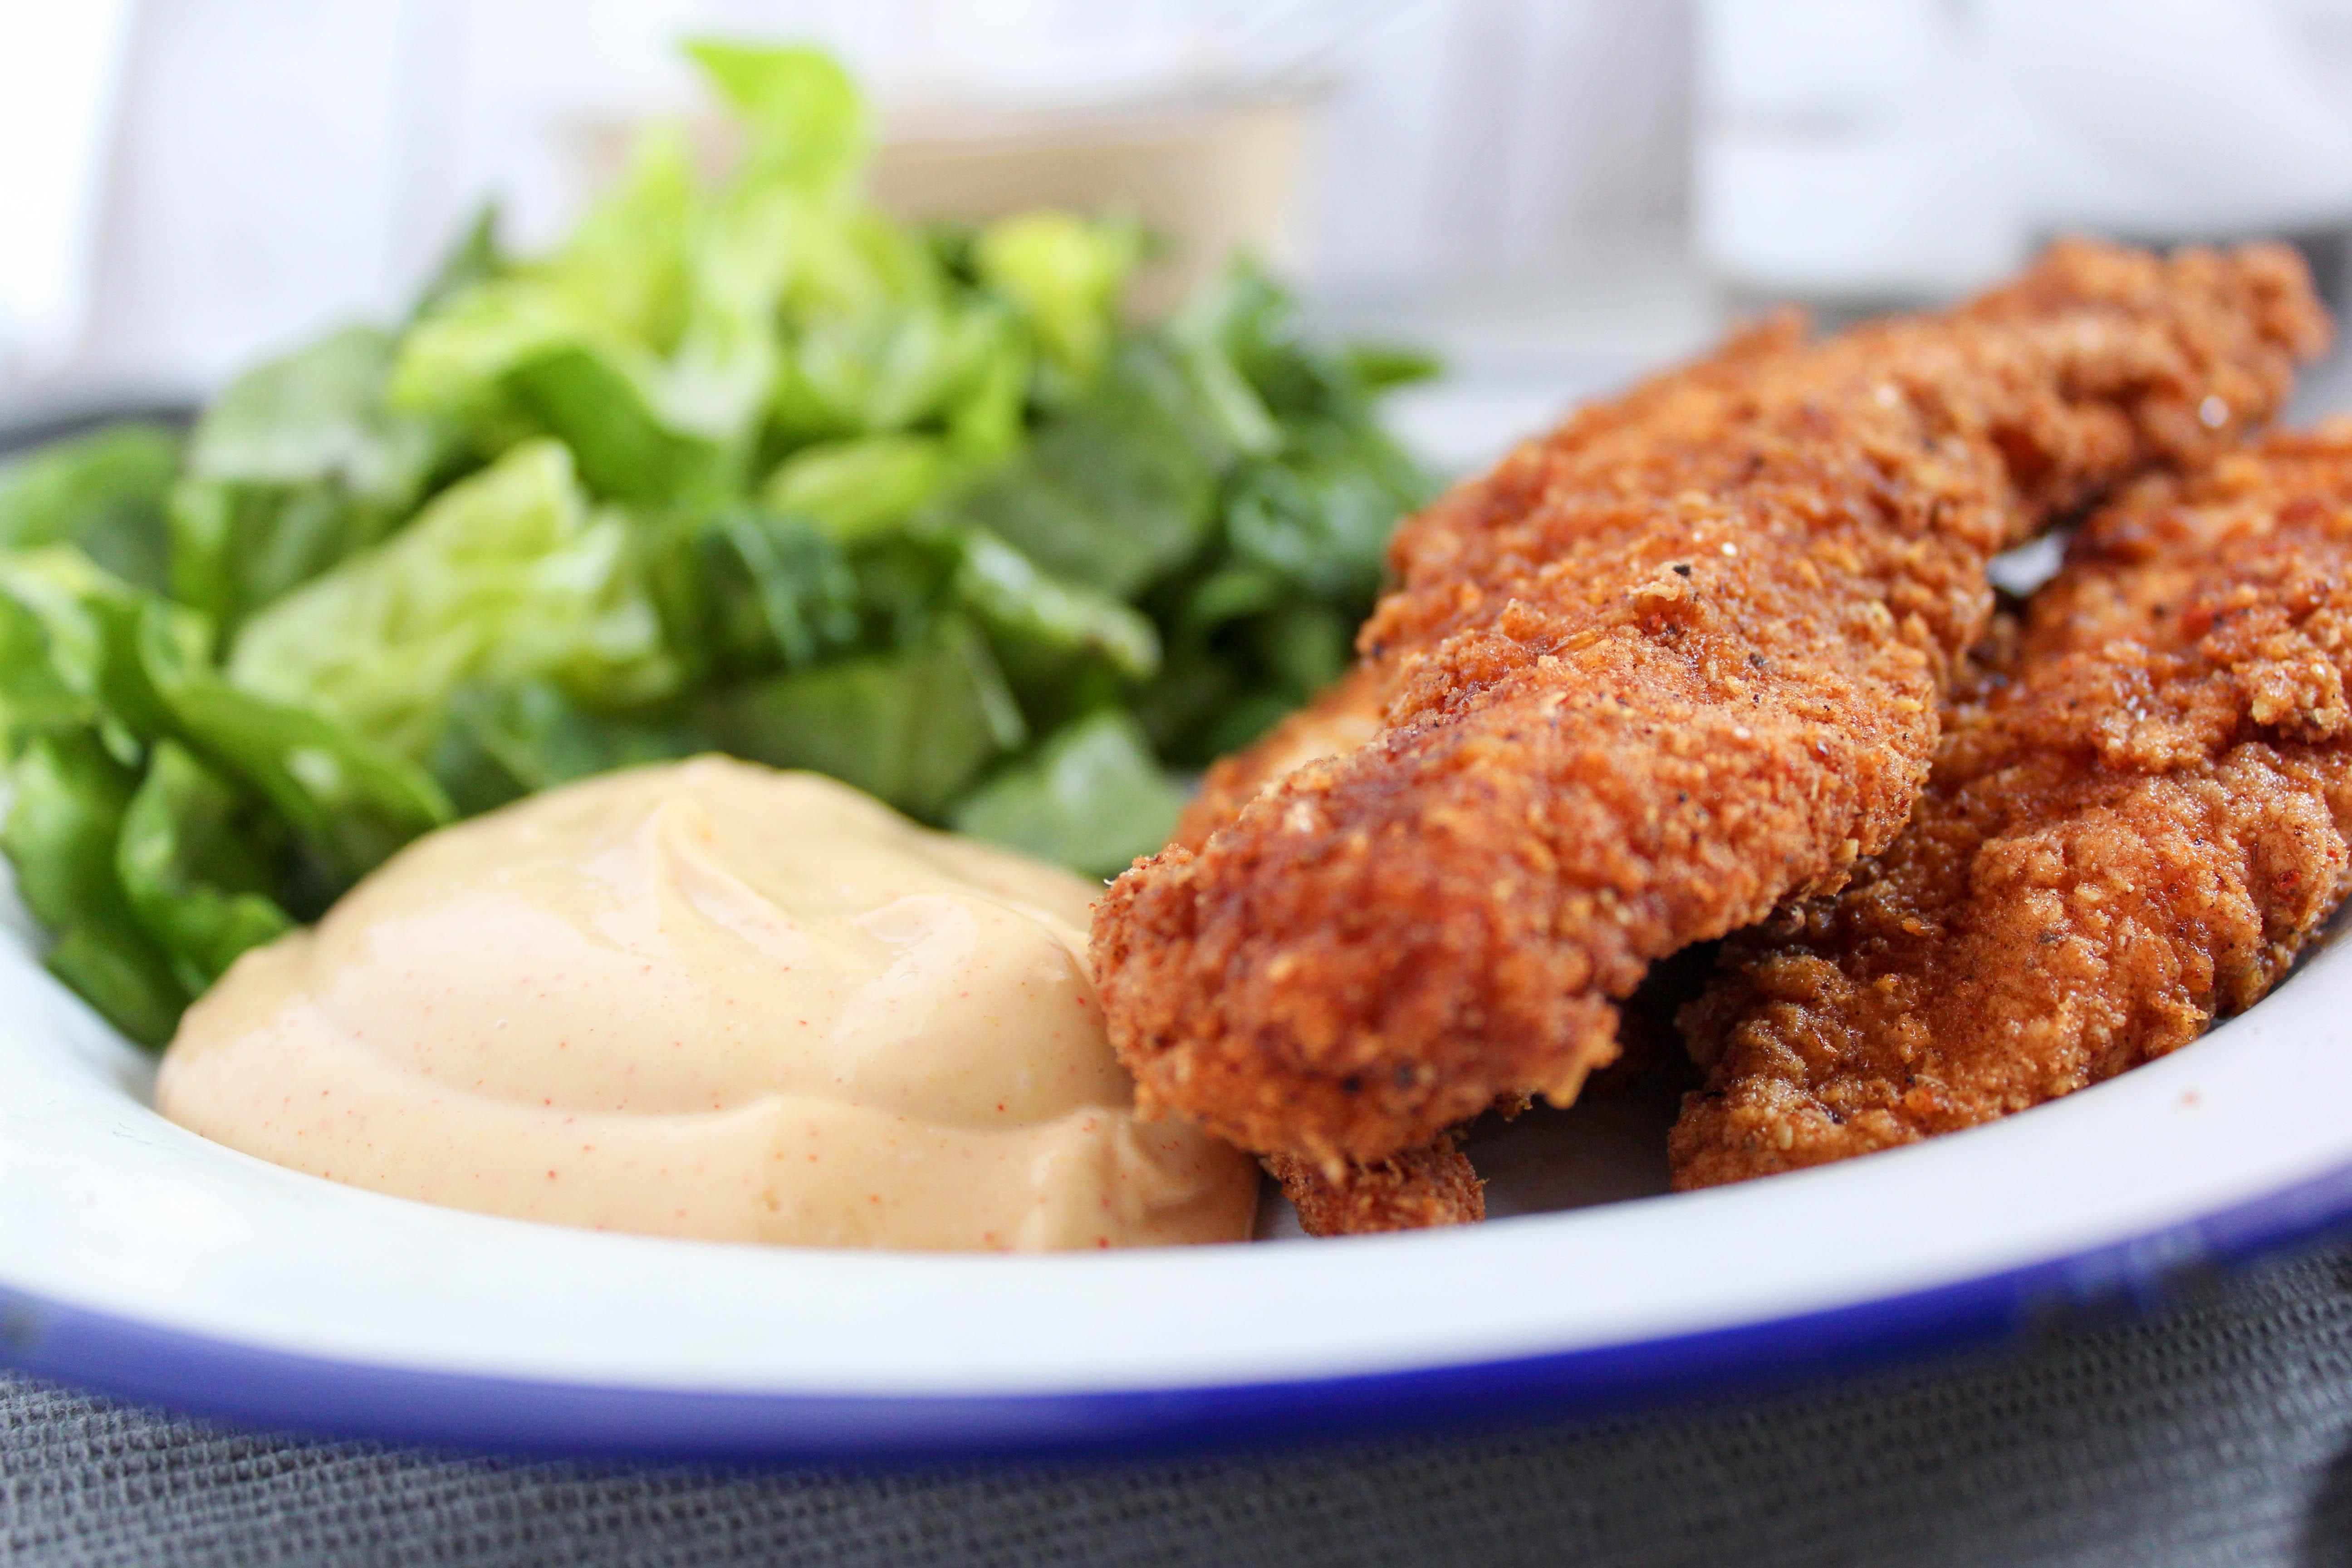 Restaurant Style Breaded Chicken Tenders